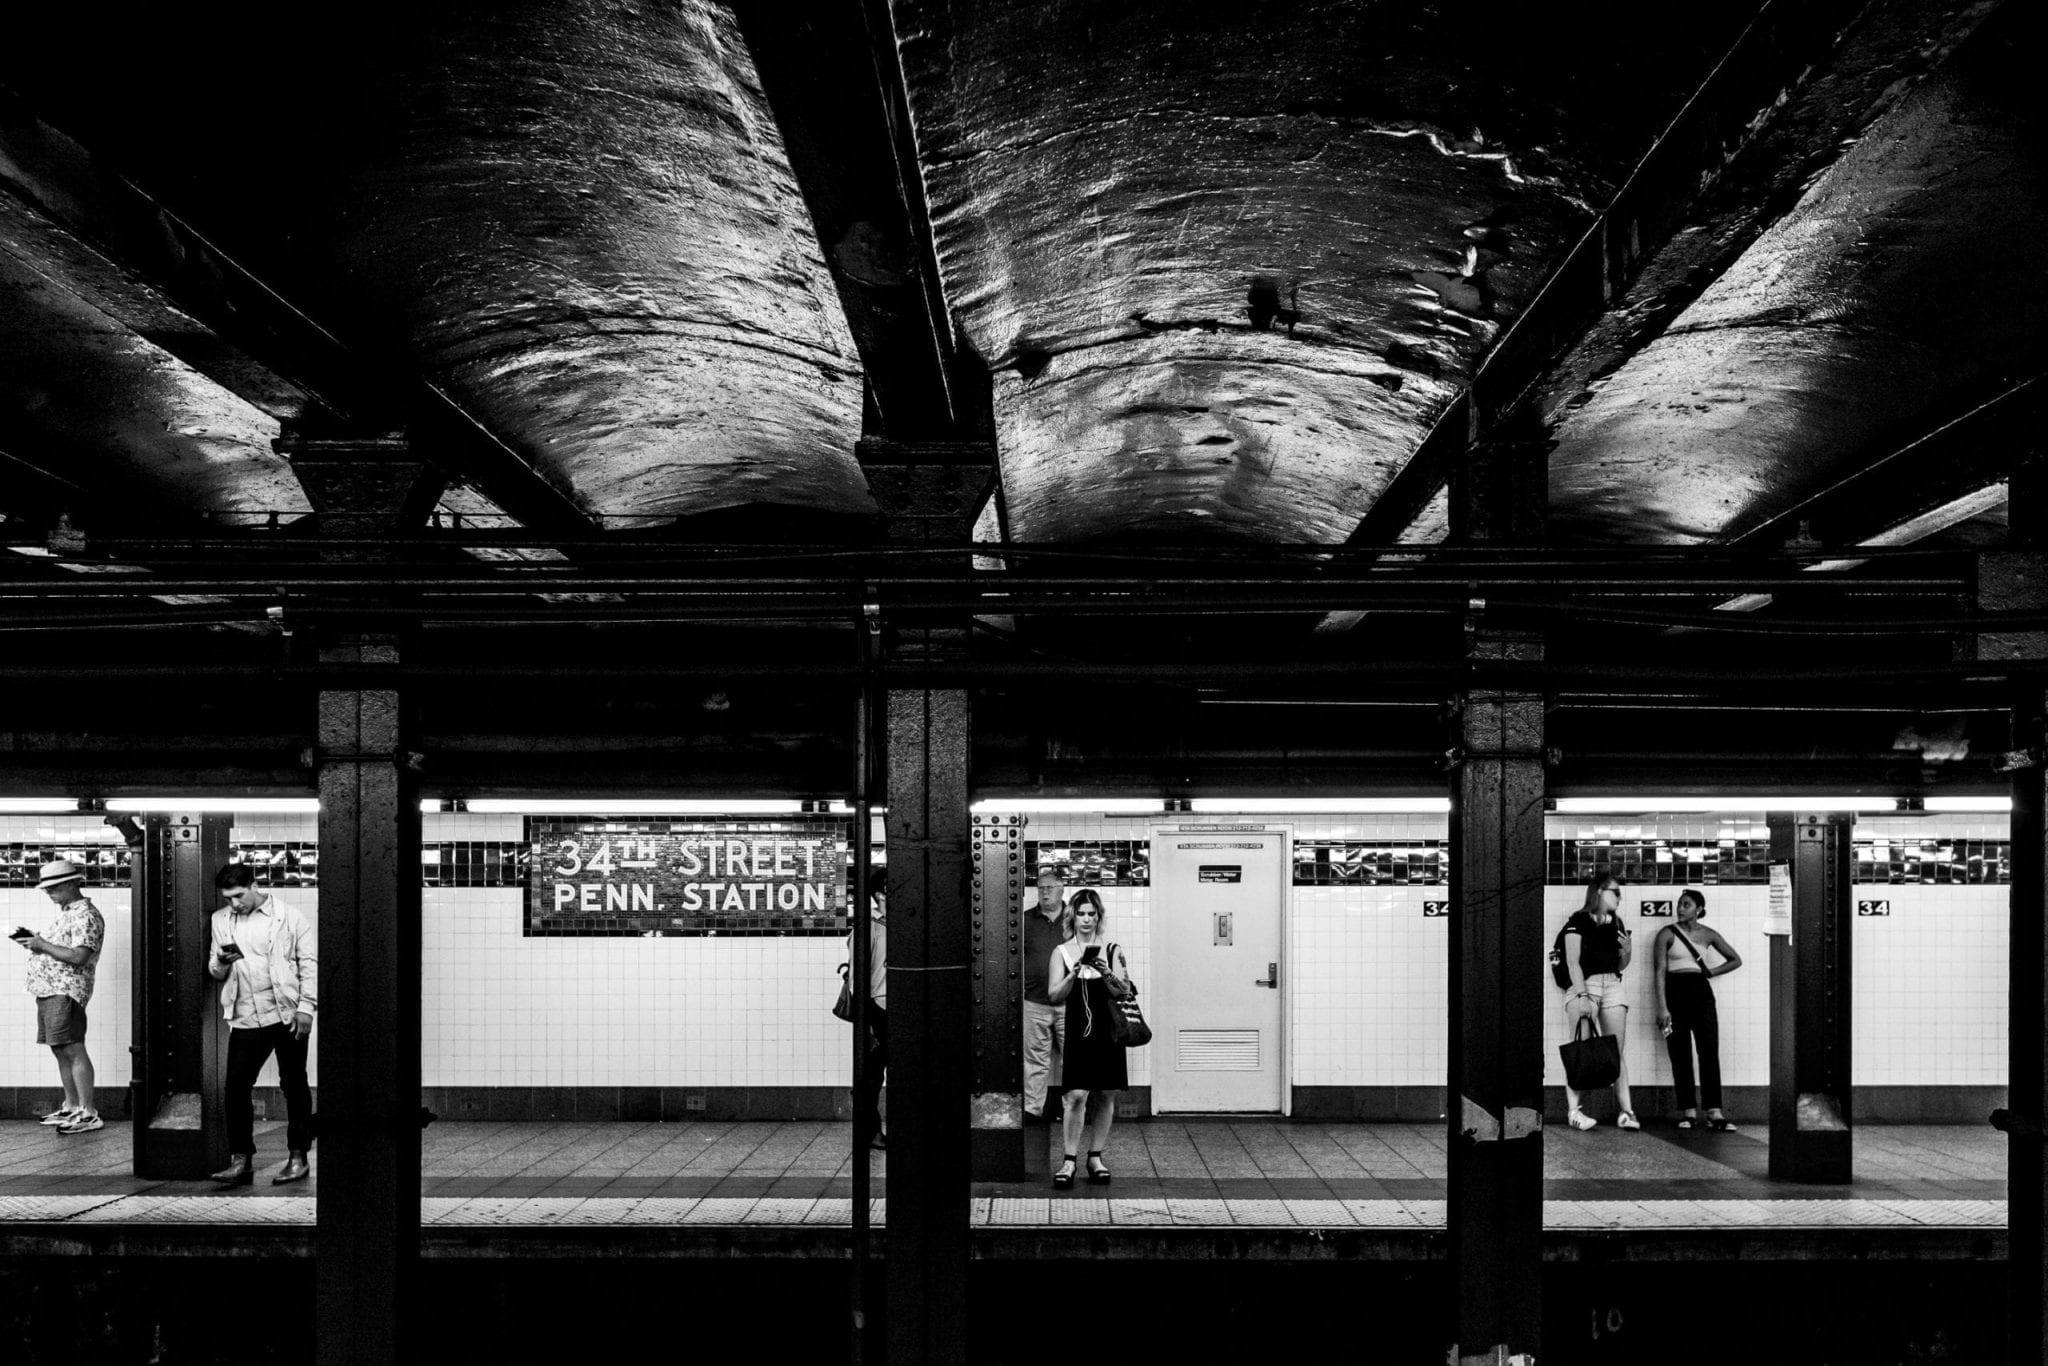 Métro New York, photo et reportage de voyage Studio End